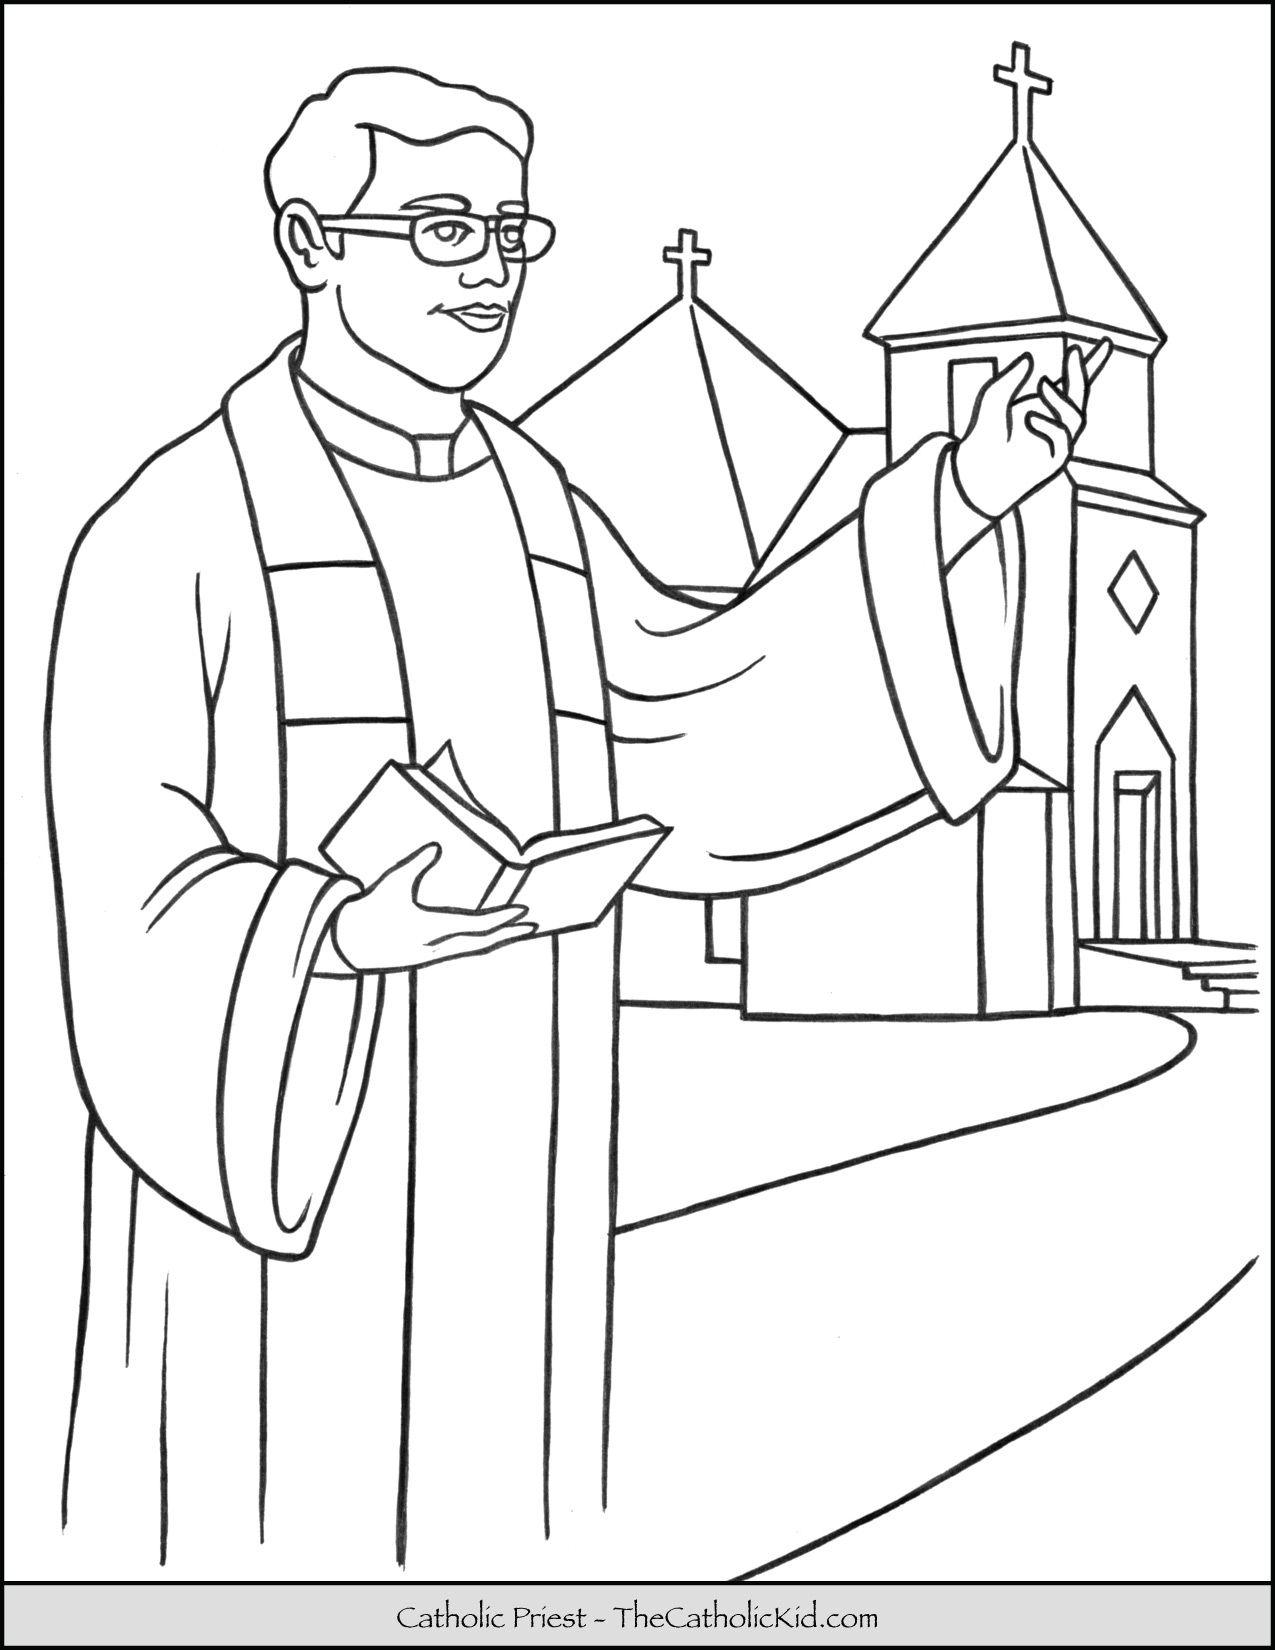 Catholic Priest Coloring Page Thecatholickid Com Catholic